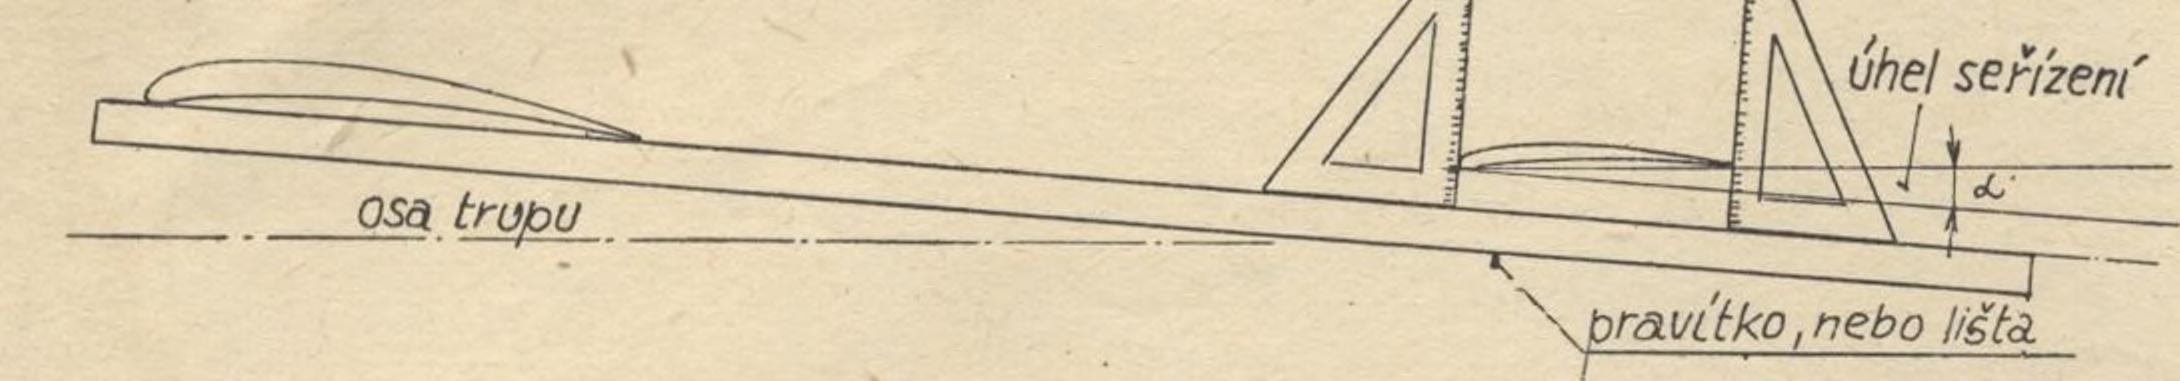 obr.2